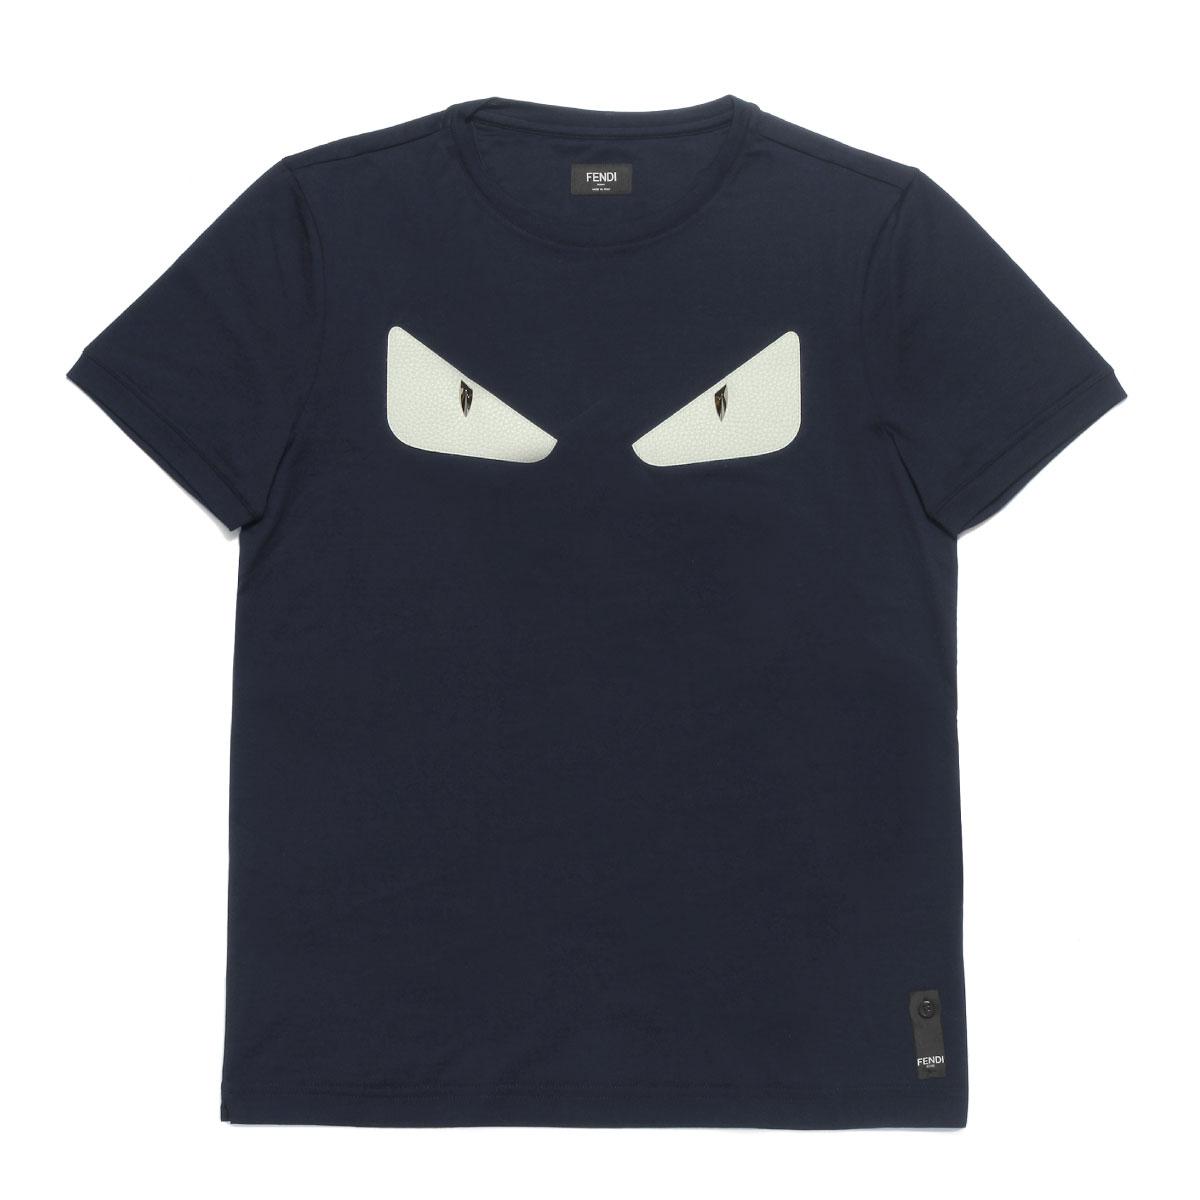 cheap for discount 201d0 ad652 フェンディ FENDI Tシャツ メンズ FY0722 94T F03LQ 半袖Tシャツ BLU NOTTE ダークブルー|インポートショップ  DOUBLE